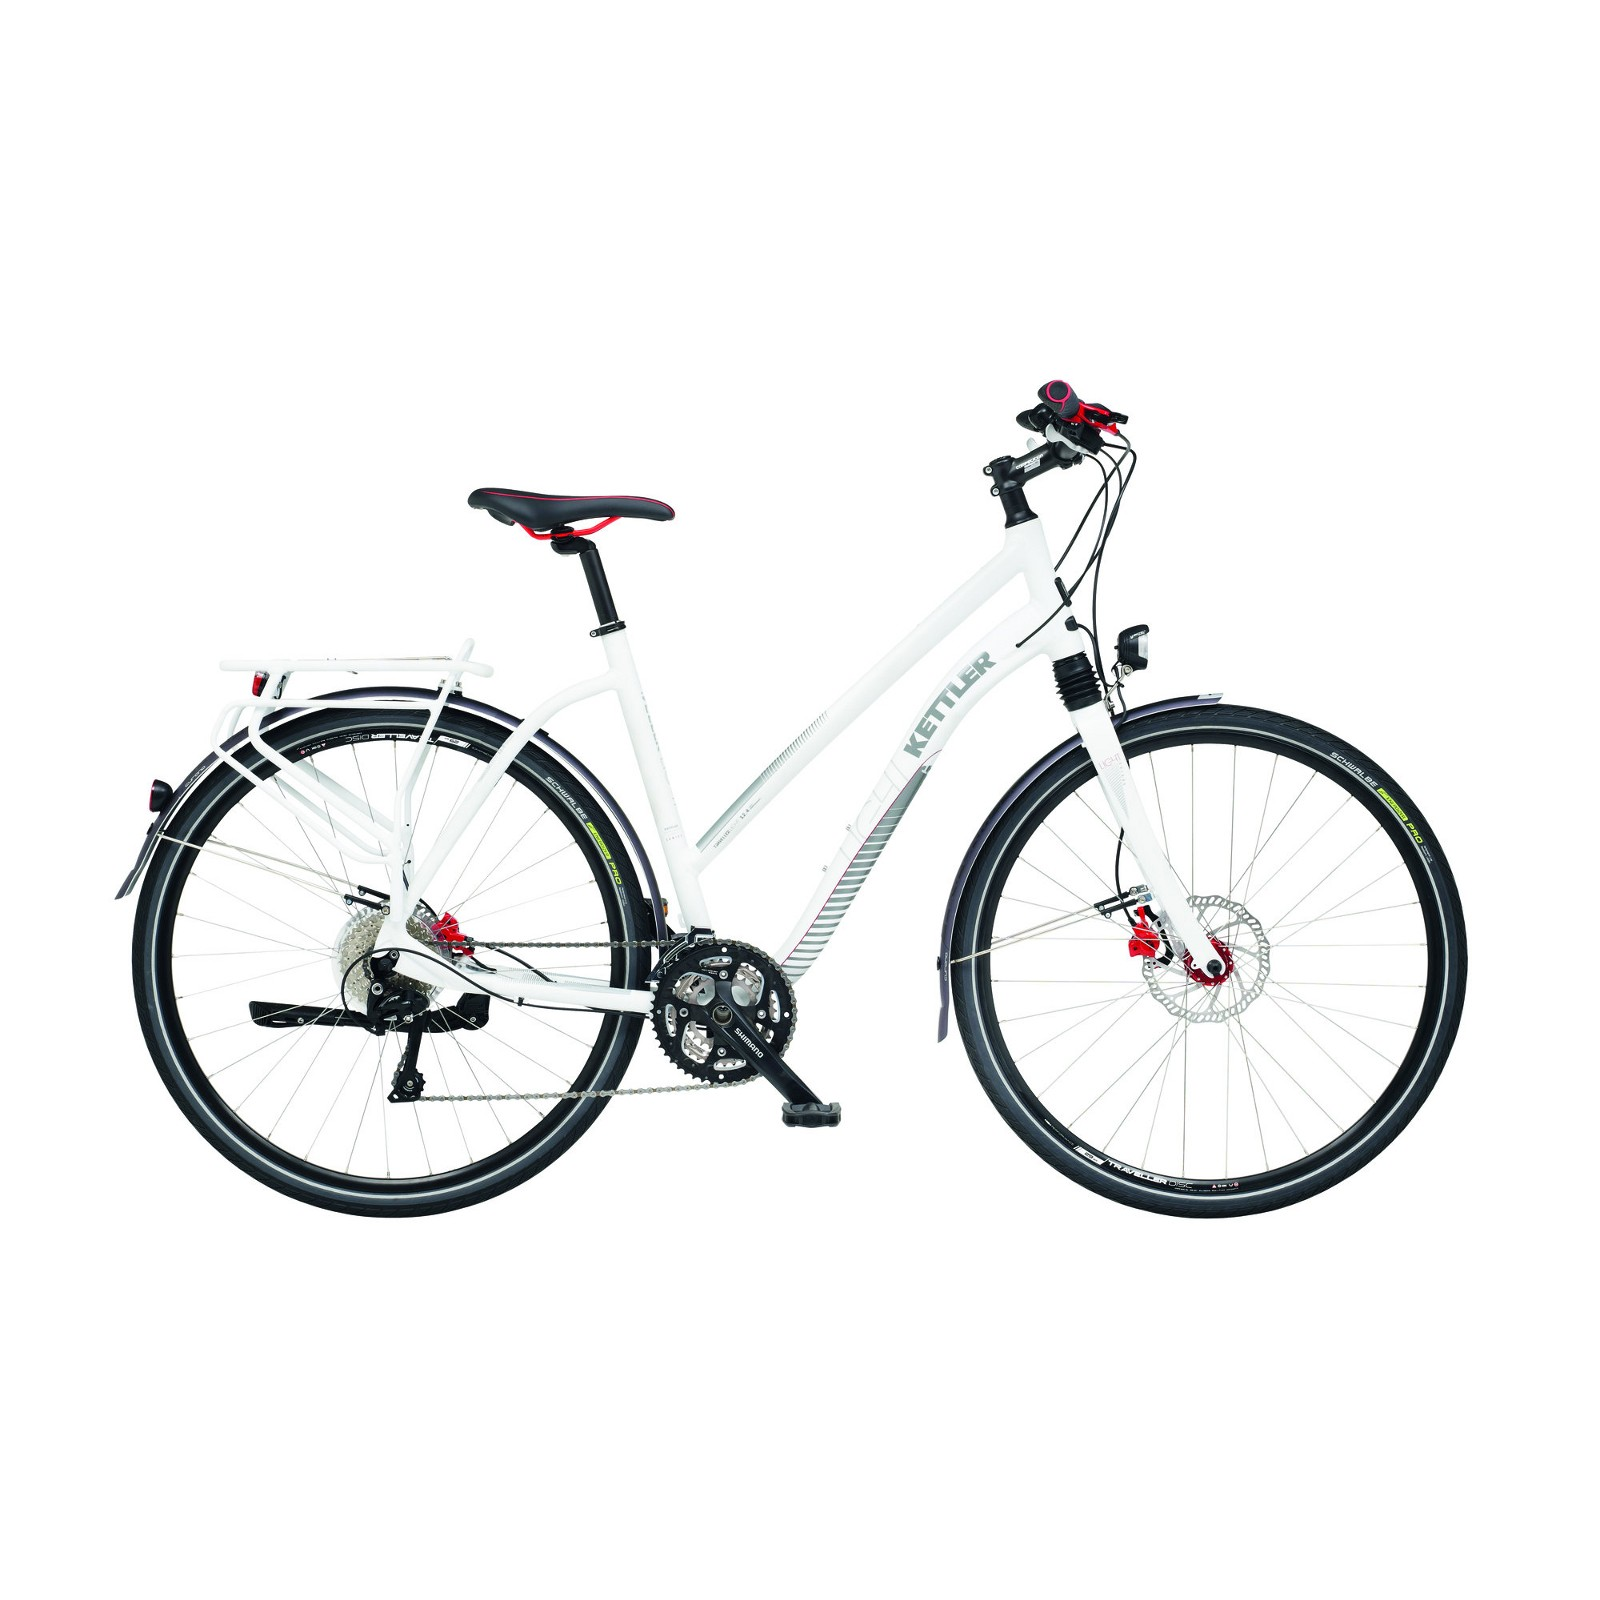 Kettler Bicycle Trekking Traveller 12 4 Light T Zial